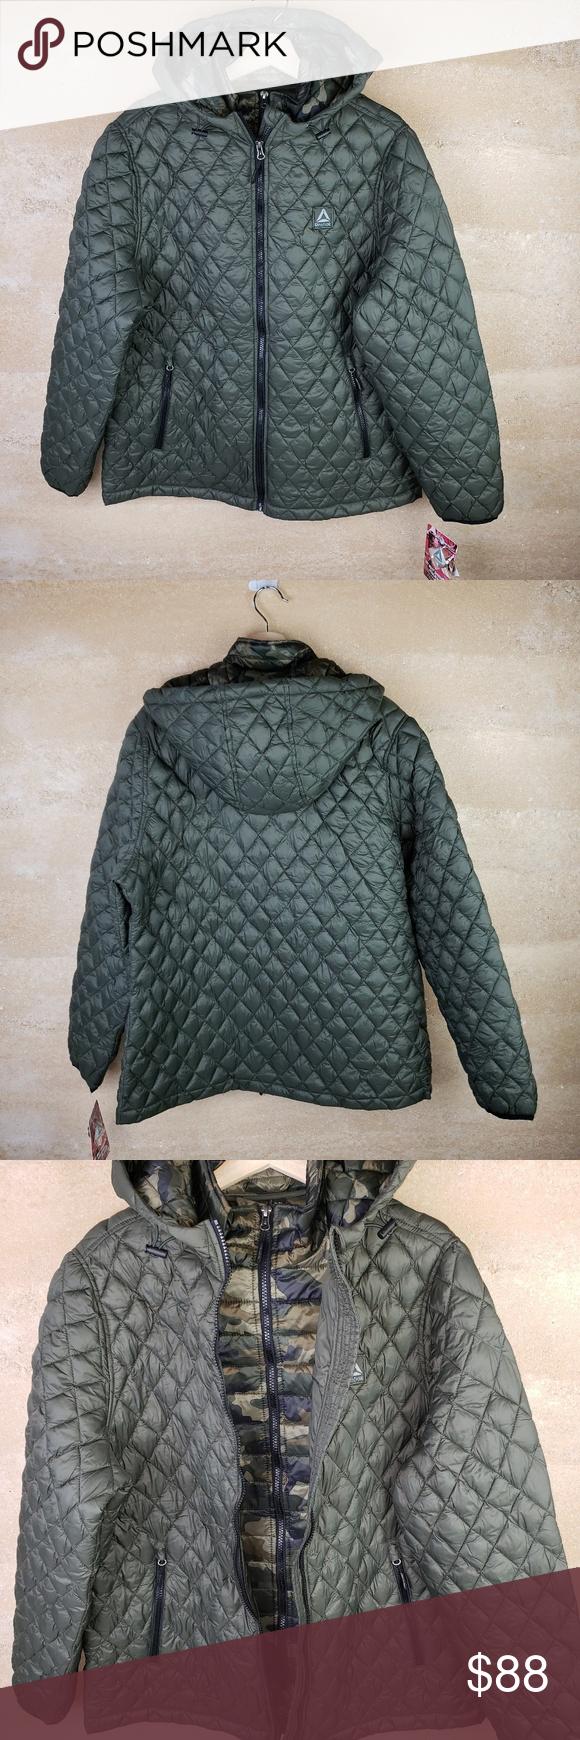 Reebok Nwt Puffer Jacket Xl Olive Camo Hood Womens Camo Reebok Clothes Design [ 1740 x 580 Pixel ]